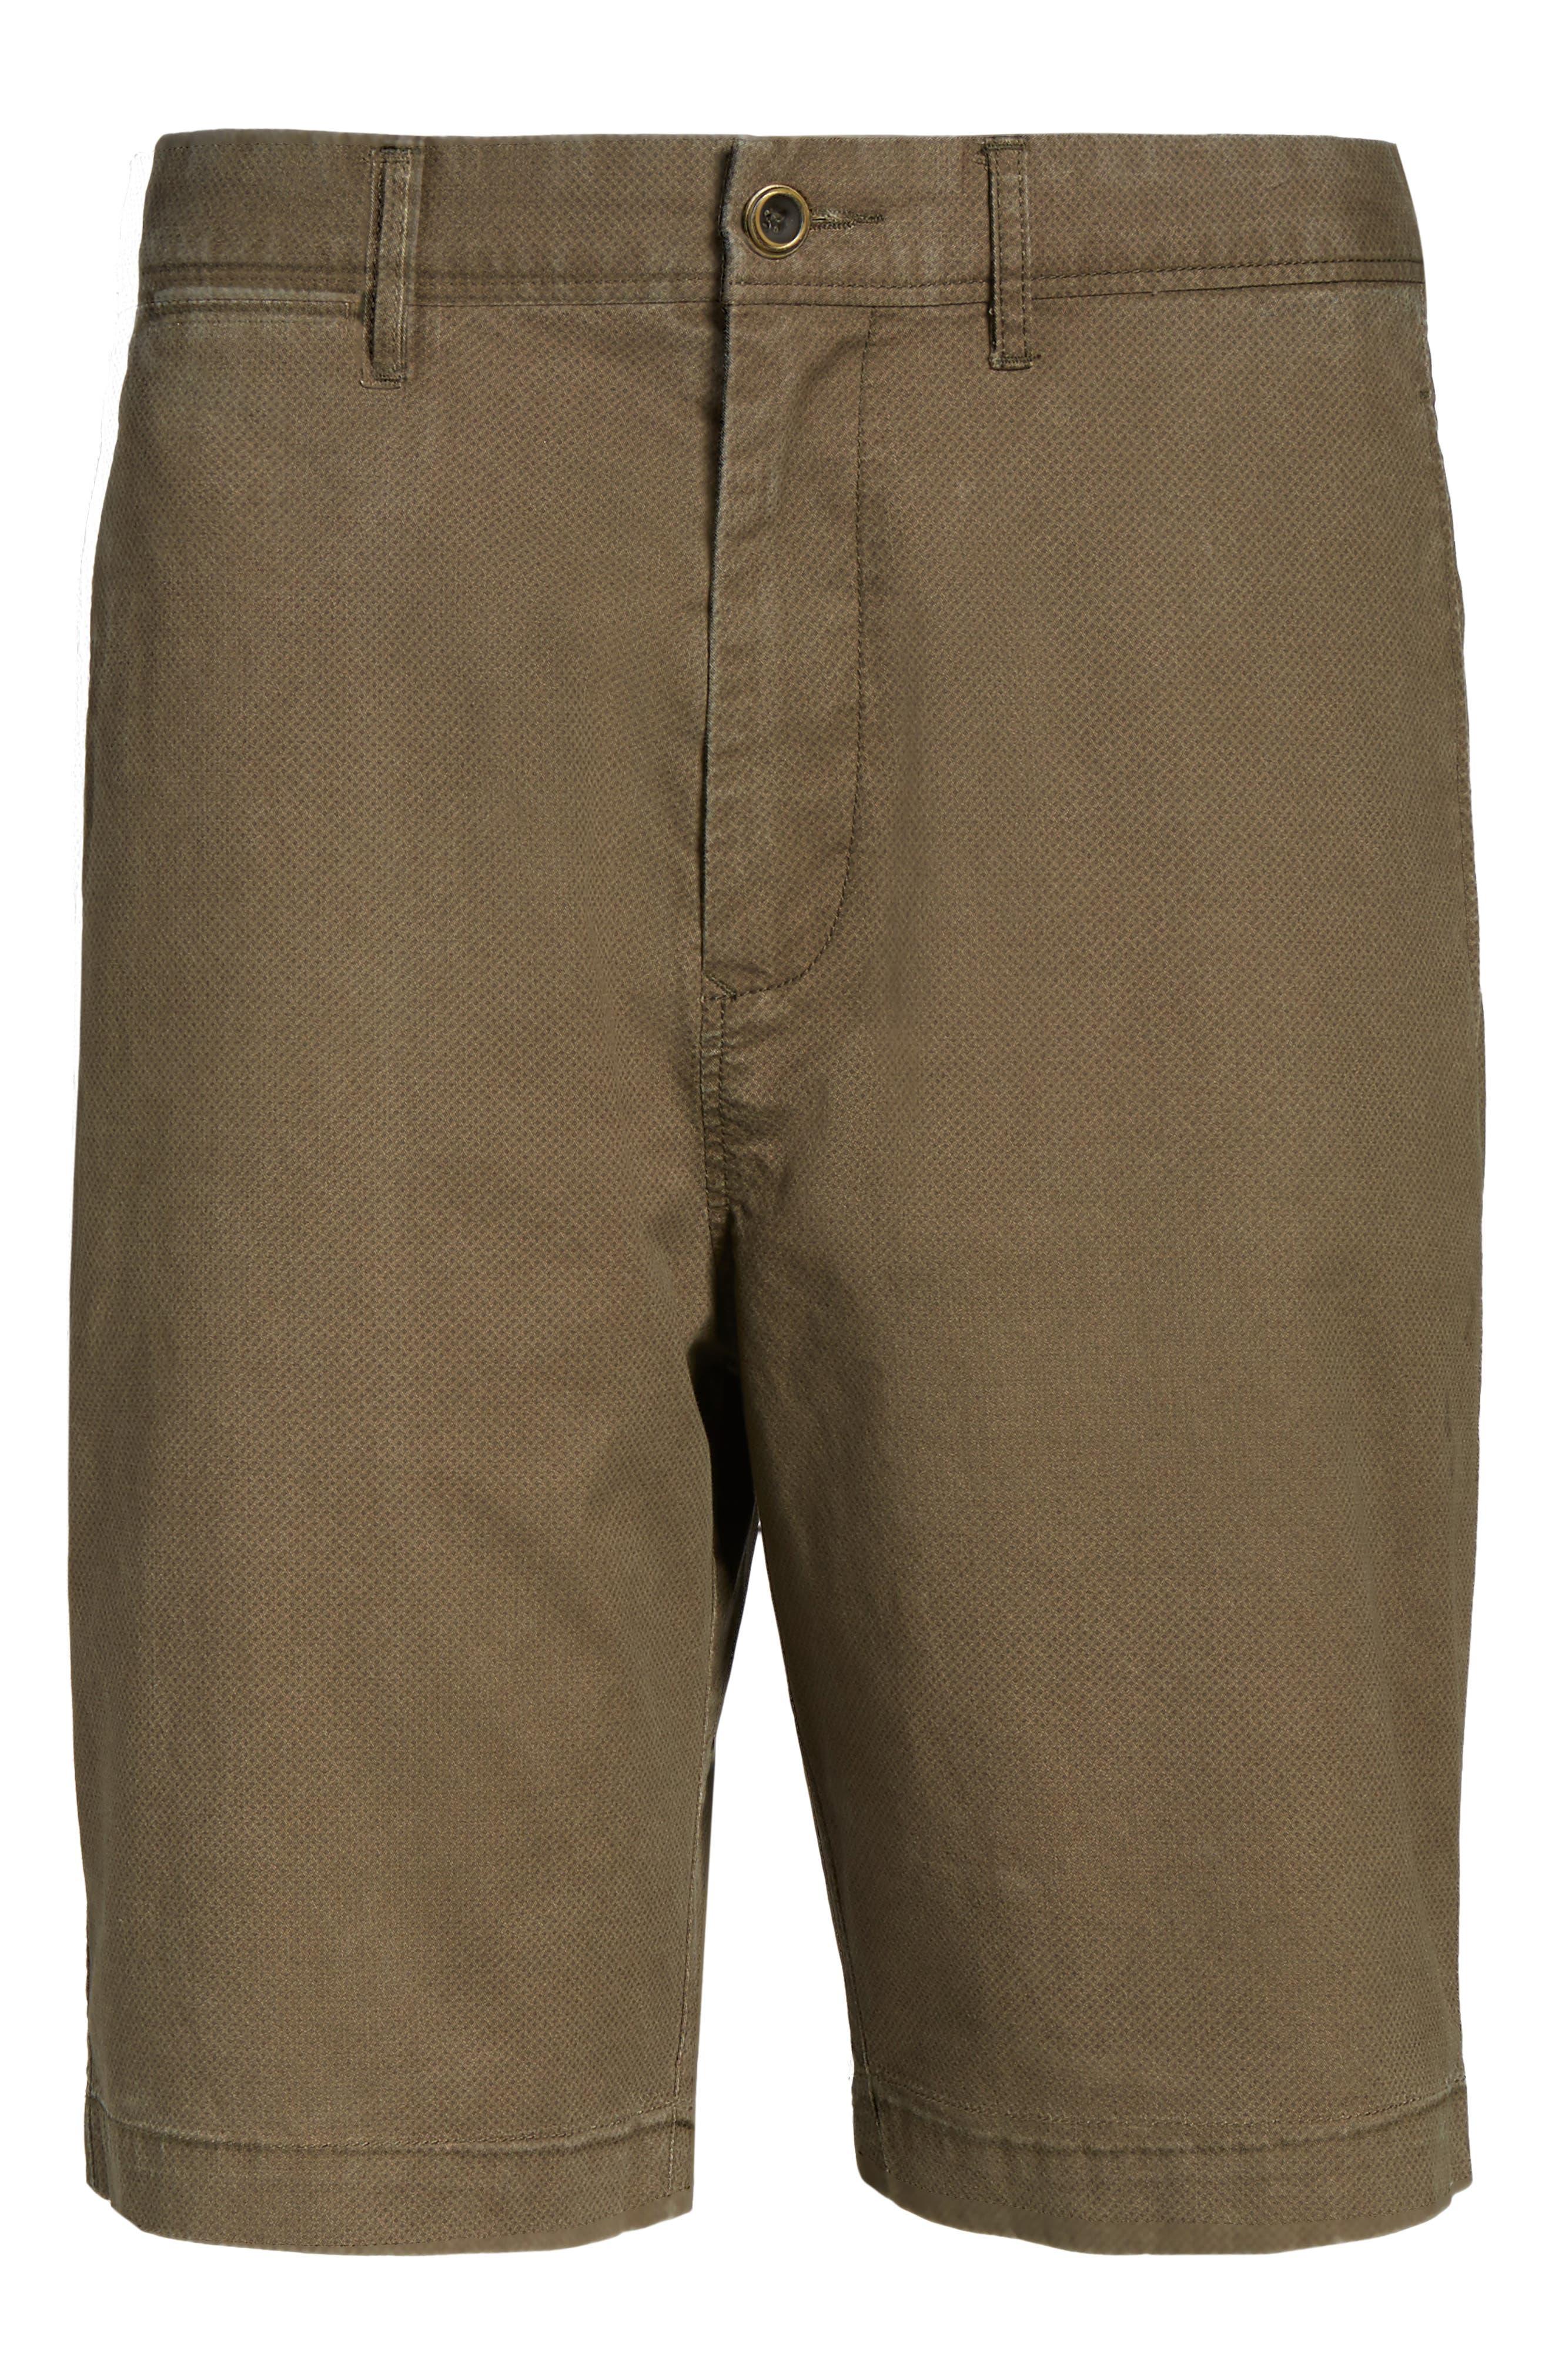 Benneydale Shorts,                             Alternate thumbnail 6, color,                             Olive